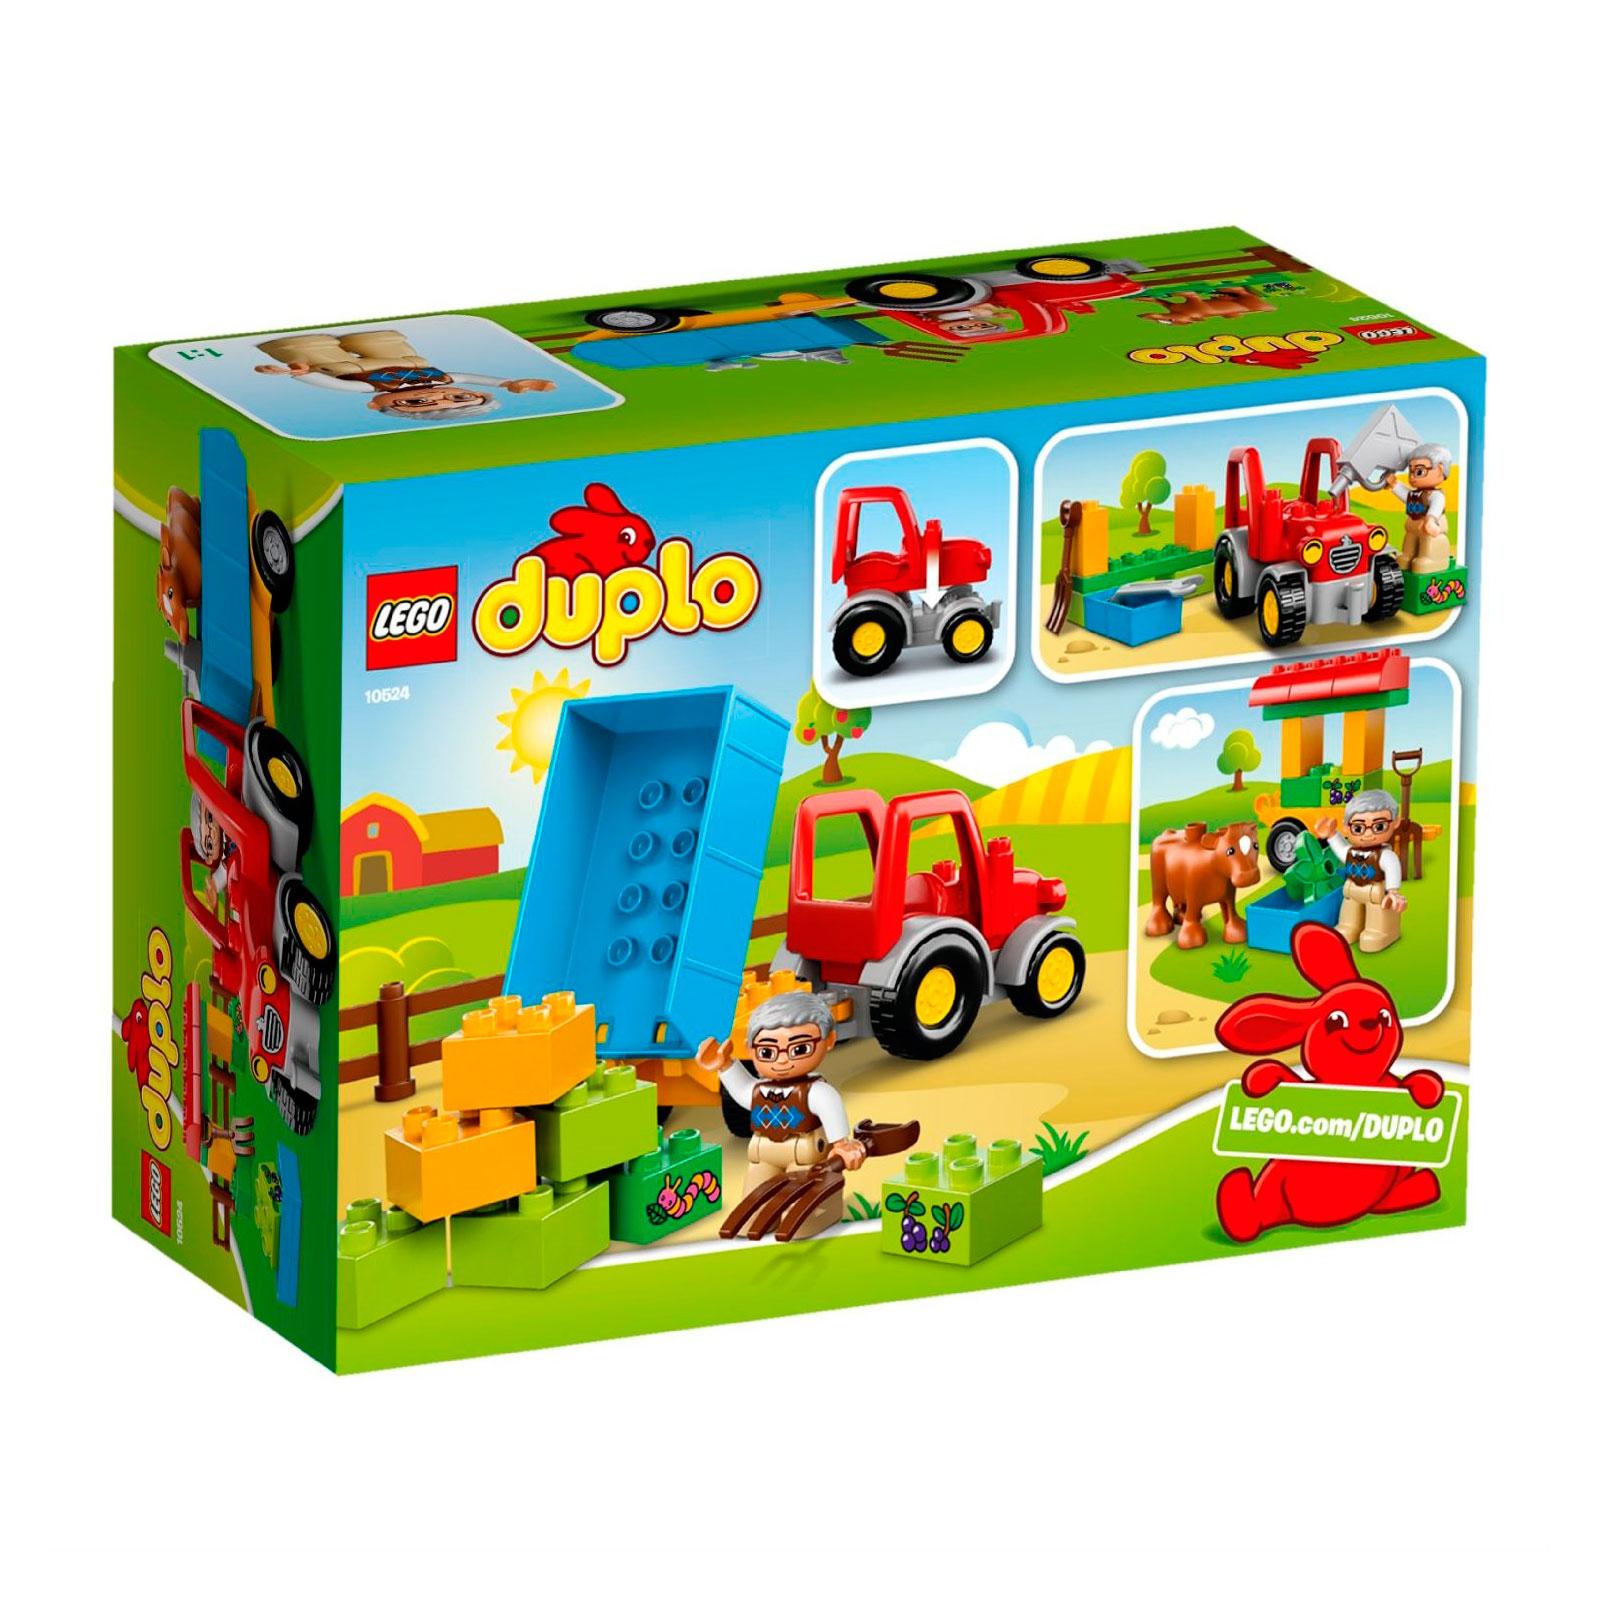 ����������� LEGO Duplo 10524 �������������������� �������